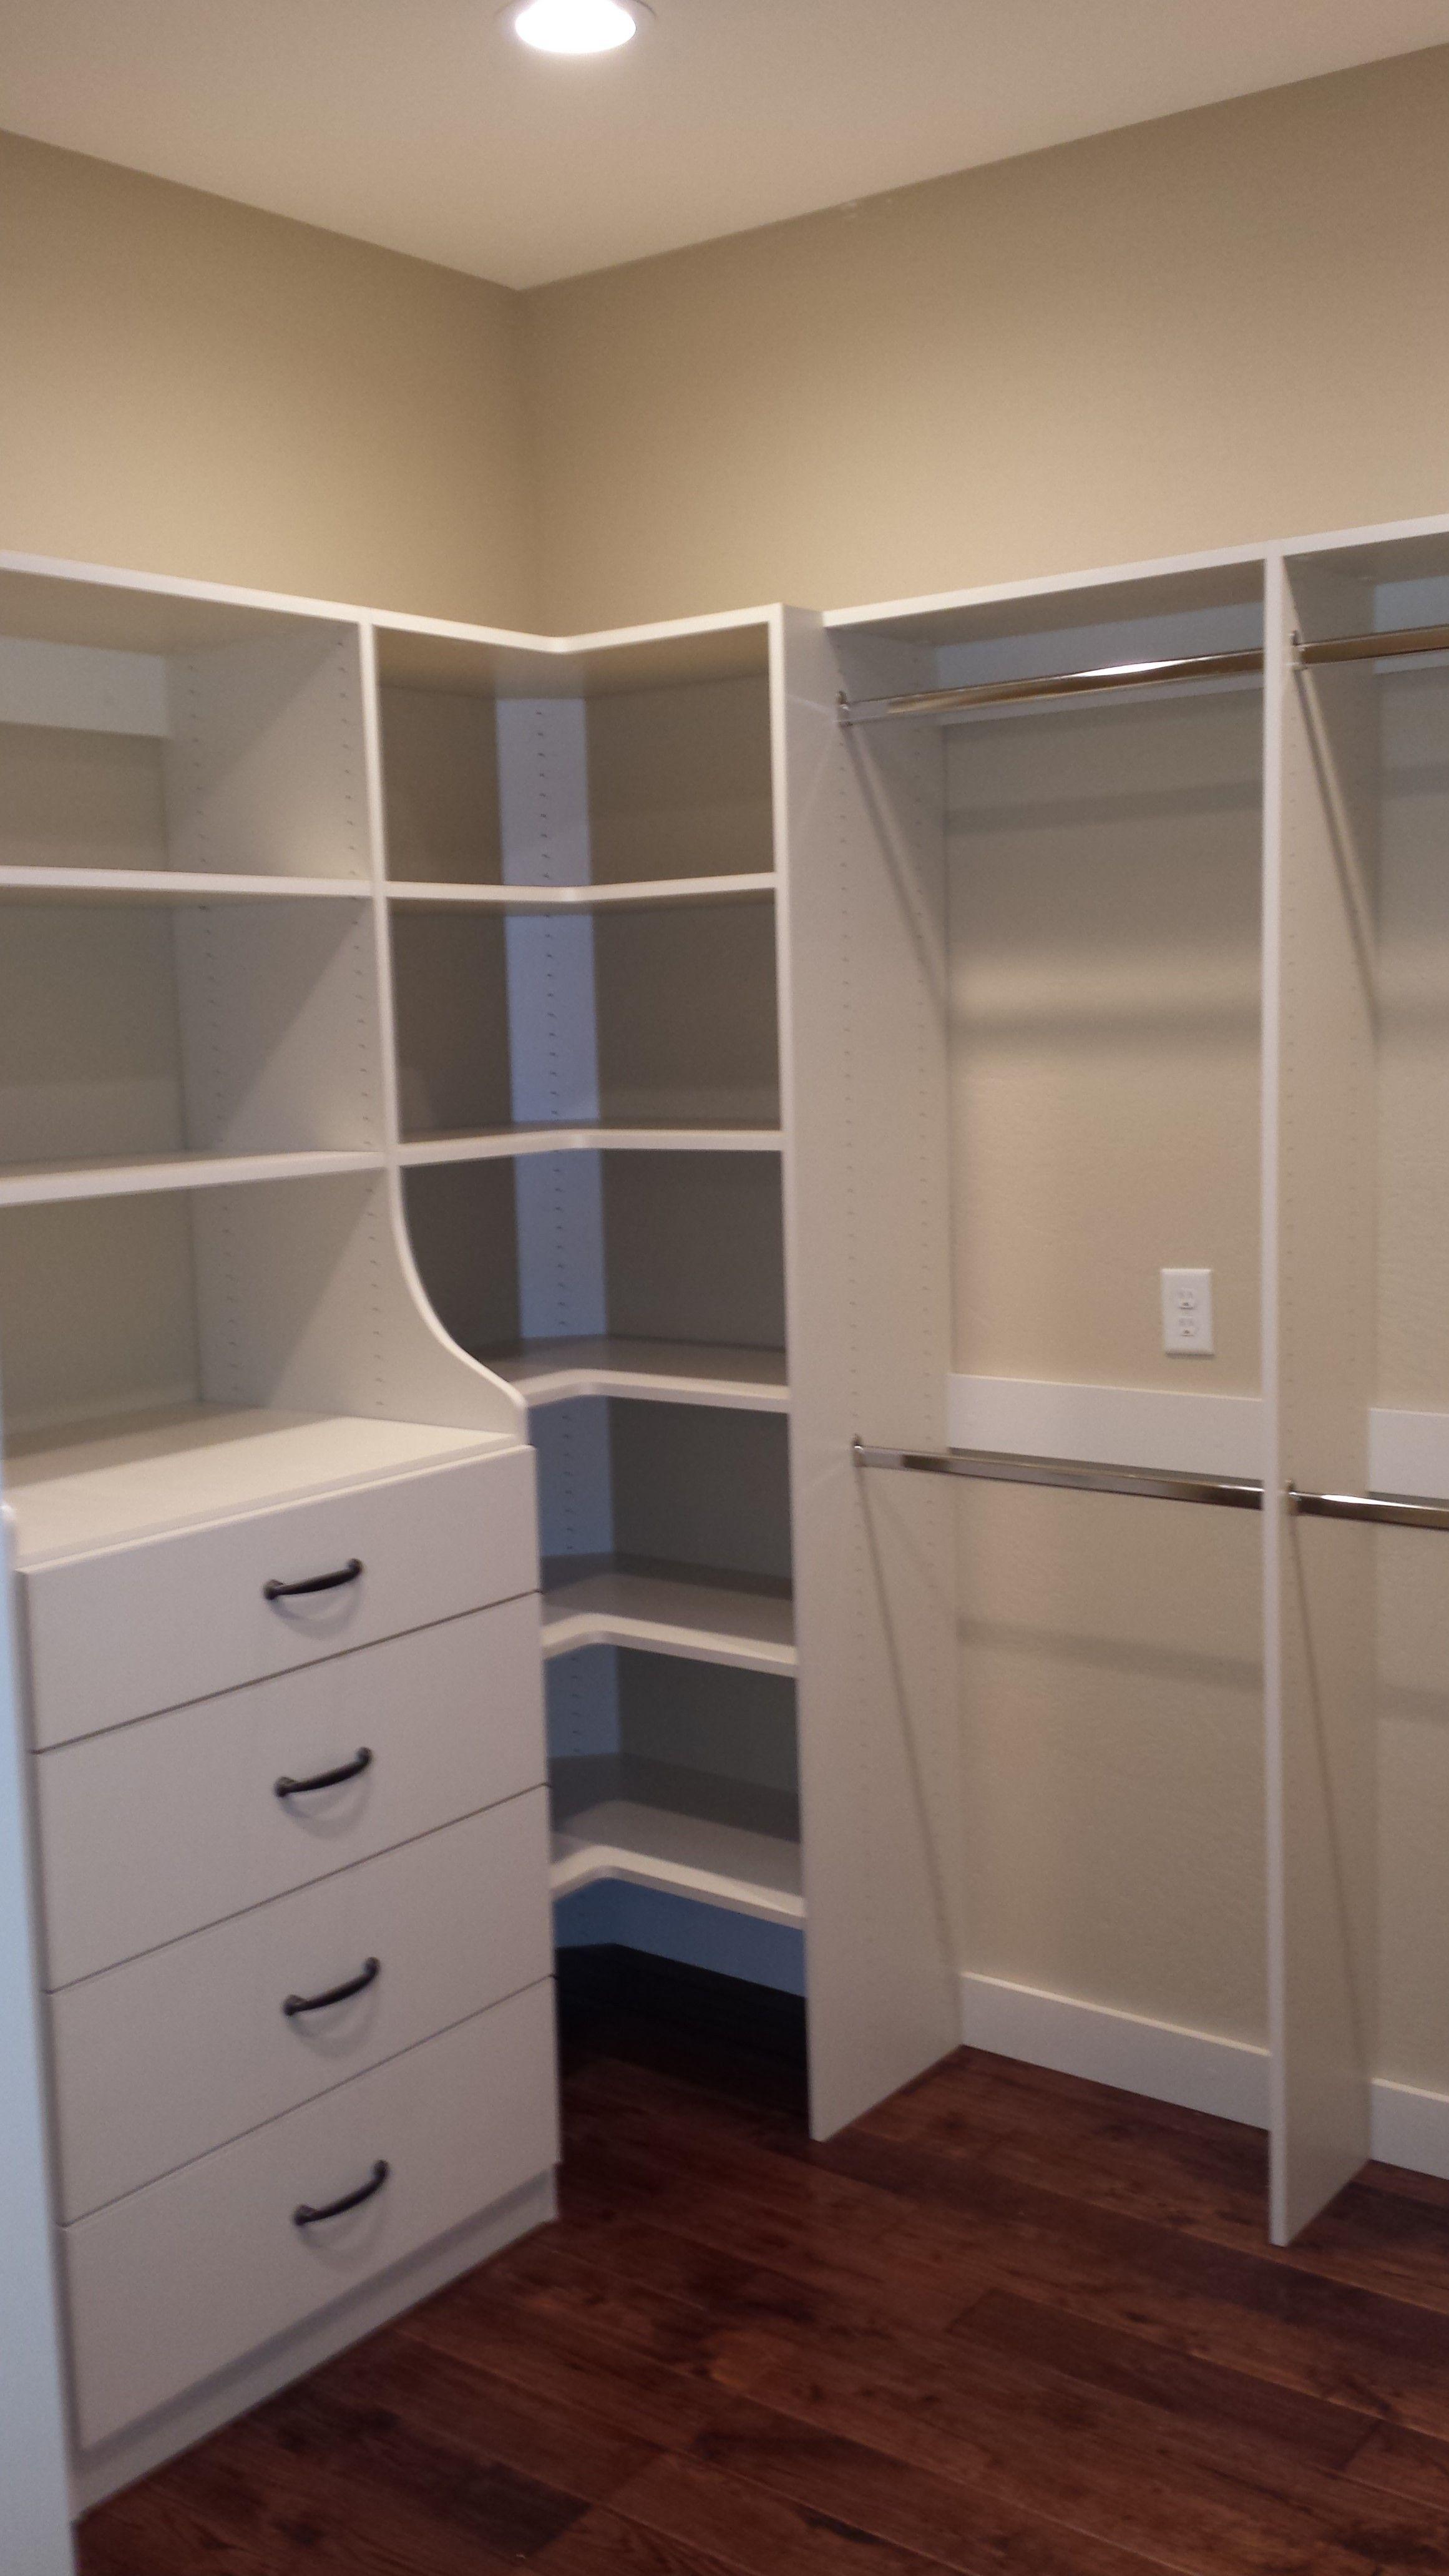 Closet Shelving Units Modern Space Saving Storage Ideas